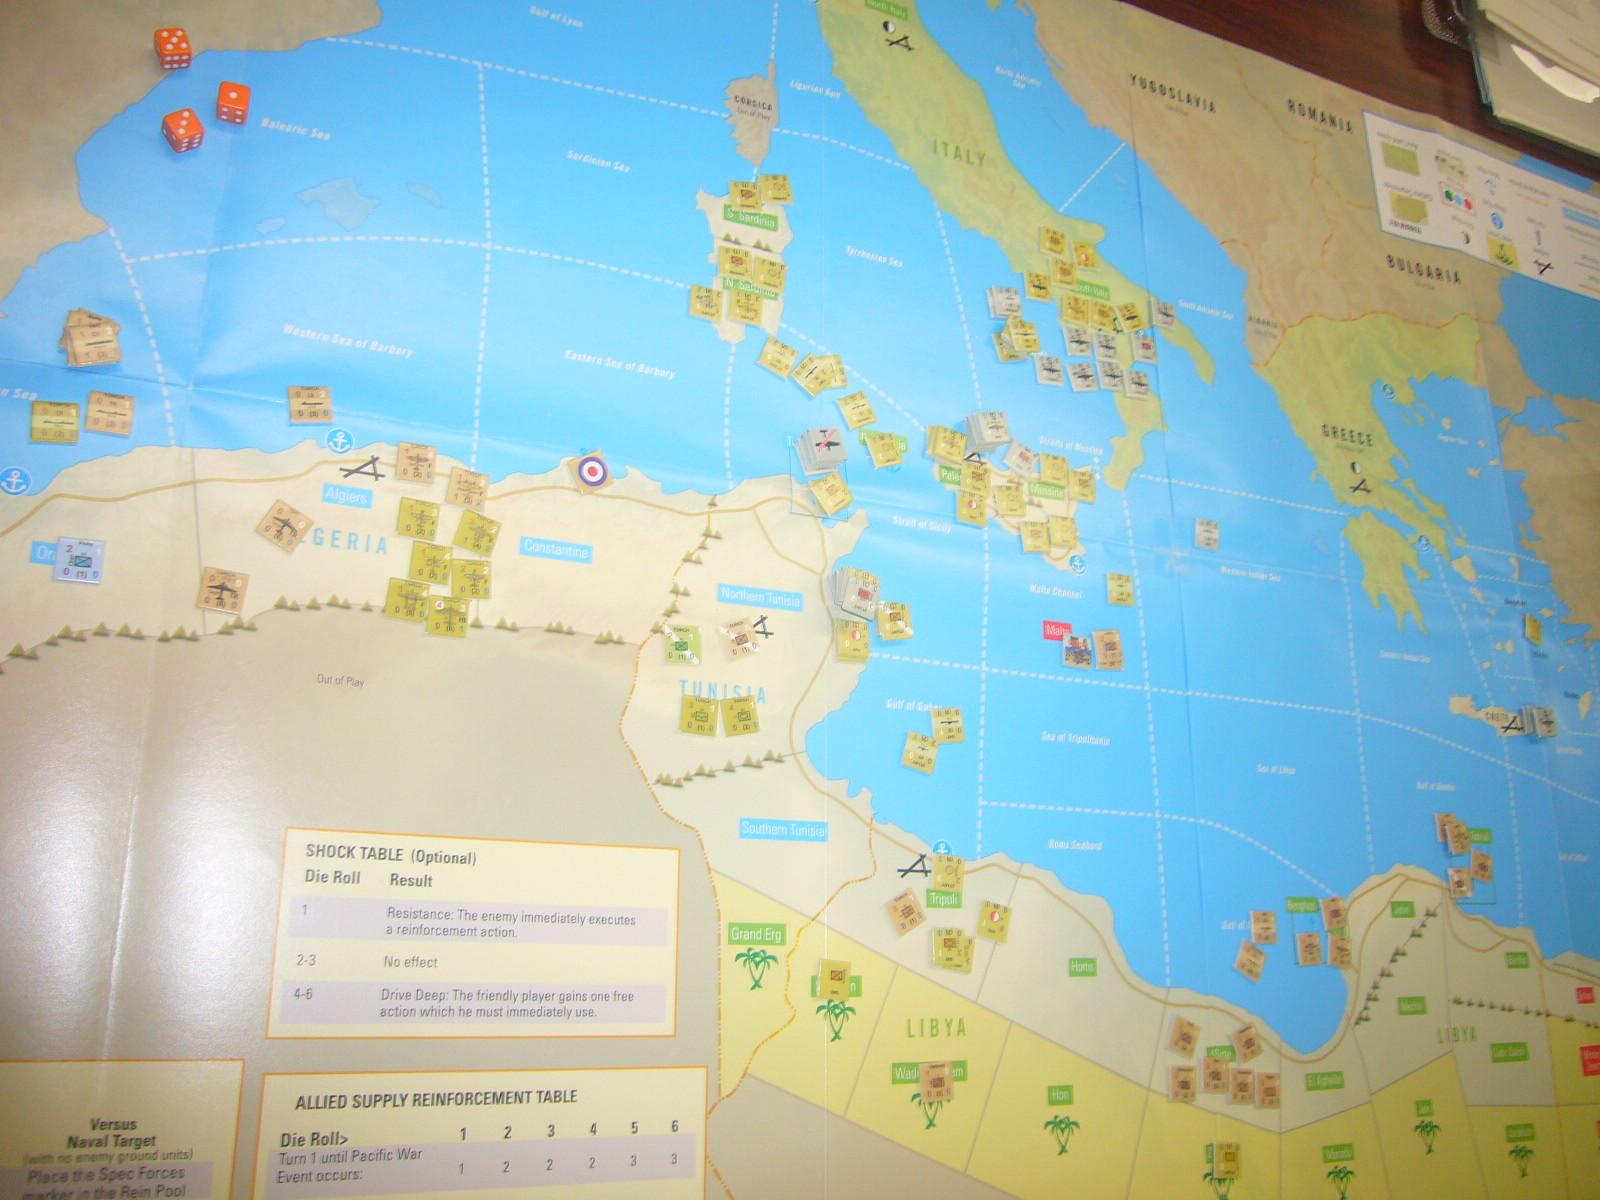 YSGA8月例会の様子その5〔これもひとつの地中海キャンペーン:(WaW誌)Mare Nostrum: War in the Mediterranean〕_b0173672_20091756.jpg